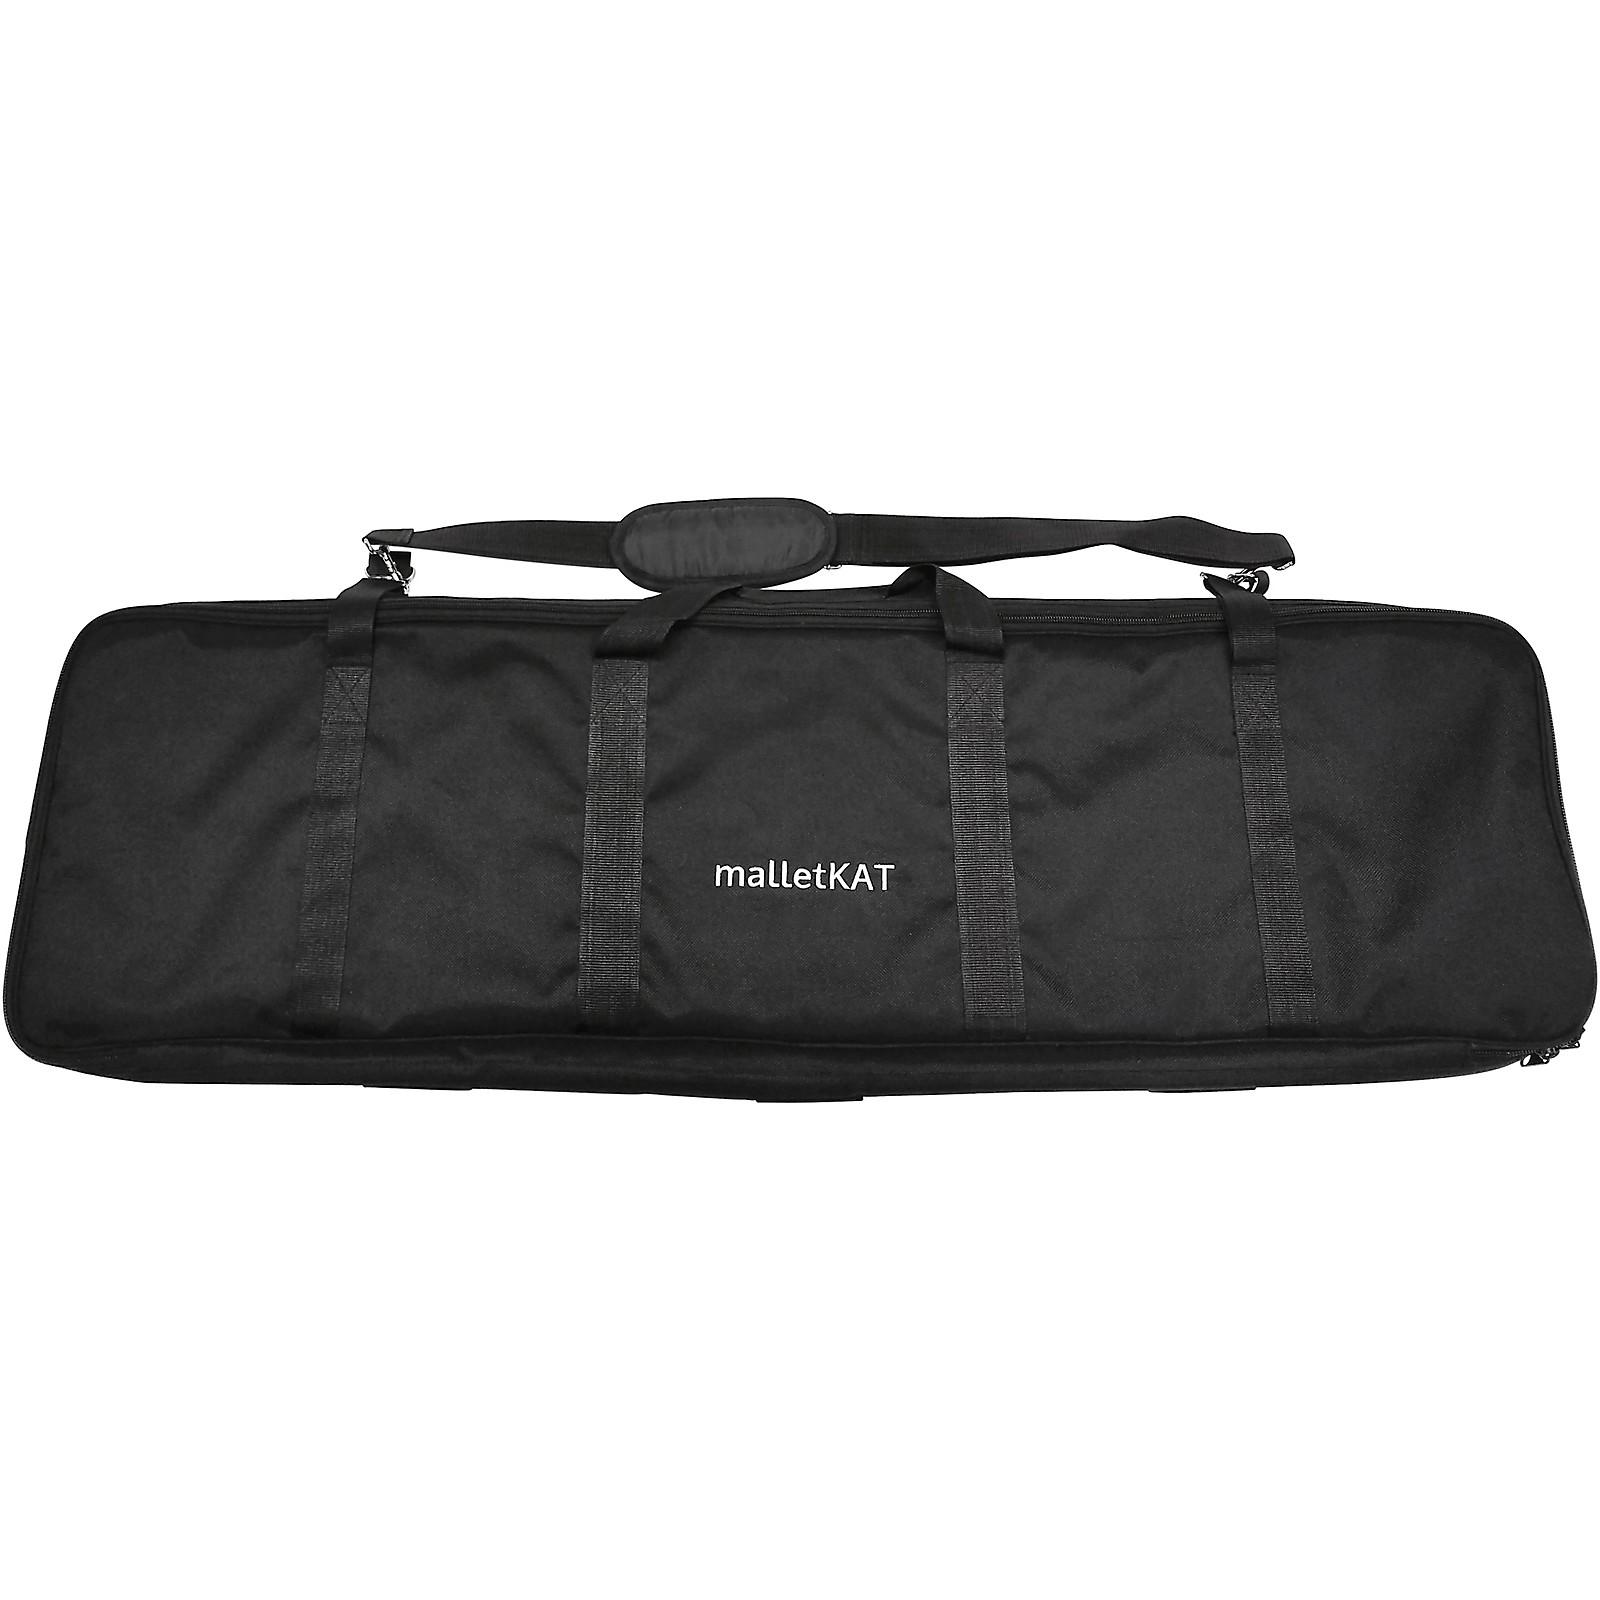 KAT Percussion Softcase for MalletKAT and VibeKAT Pro